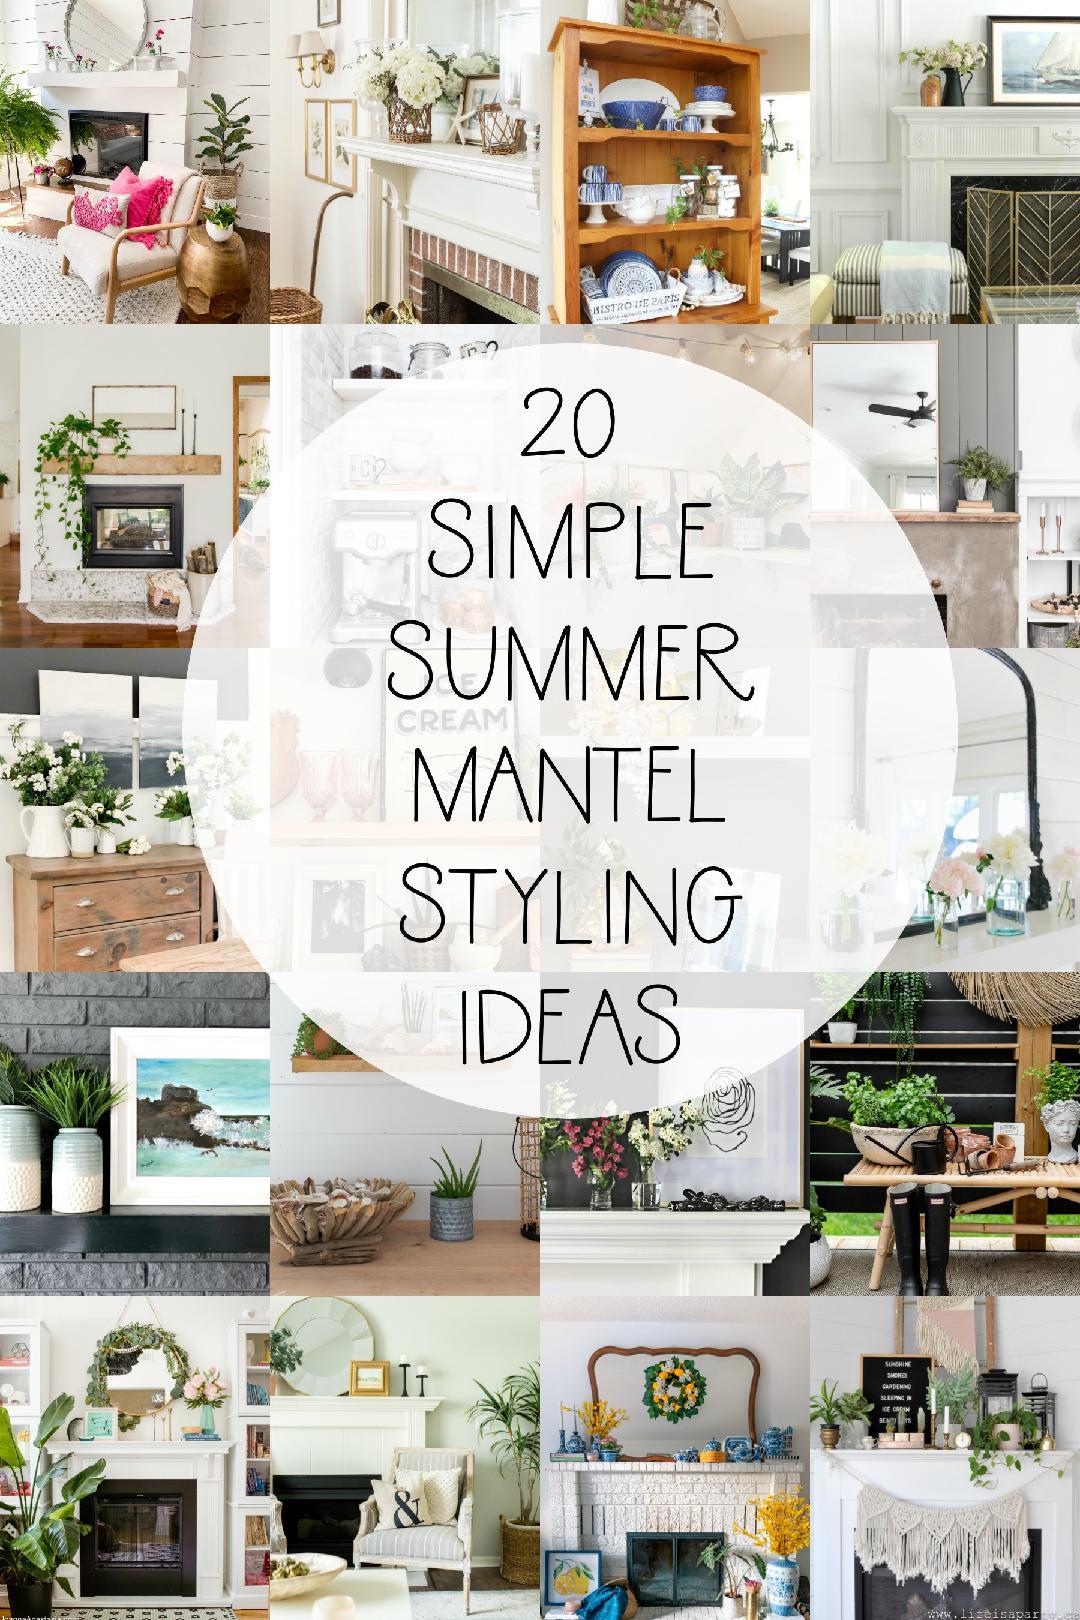 20 Simple Summer Mantel Styling Ideas